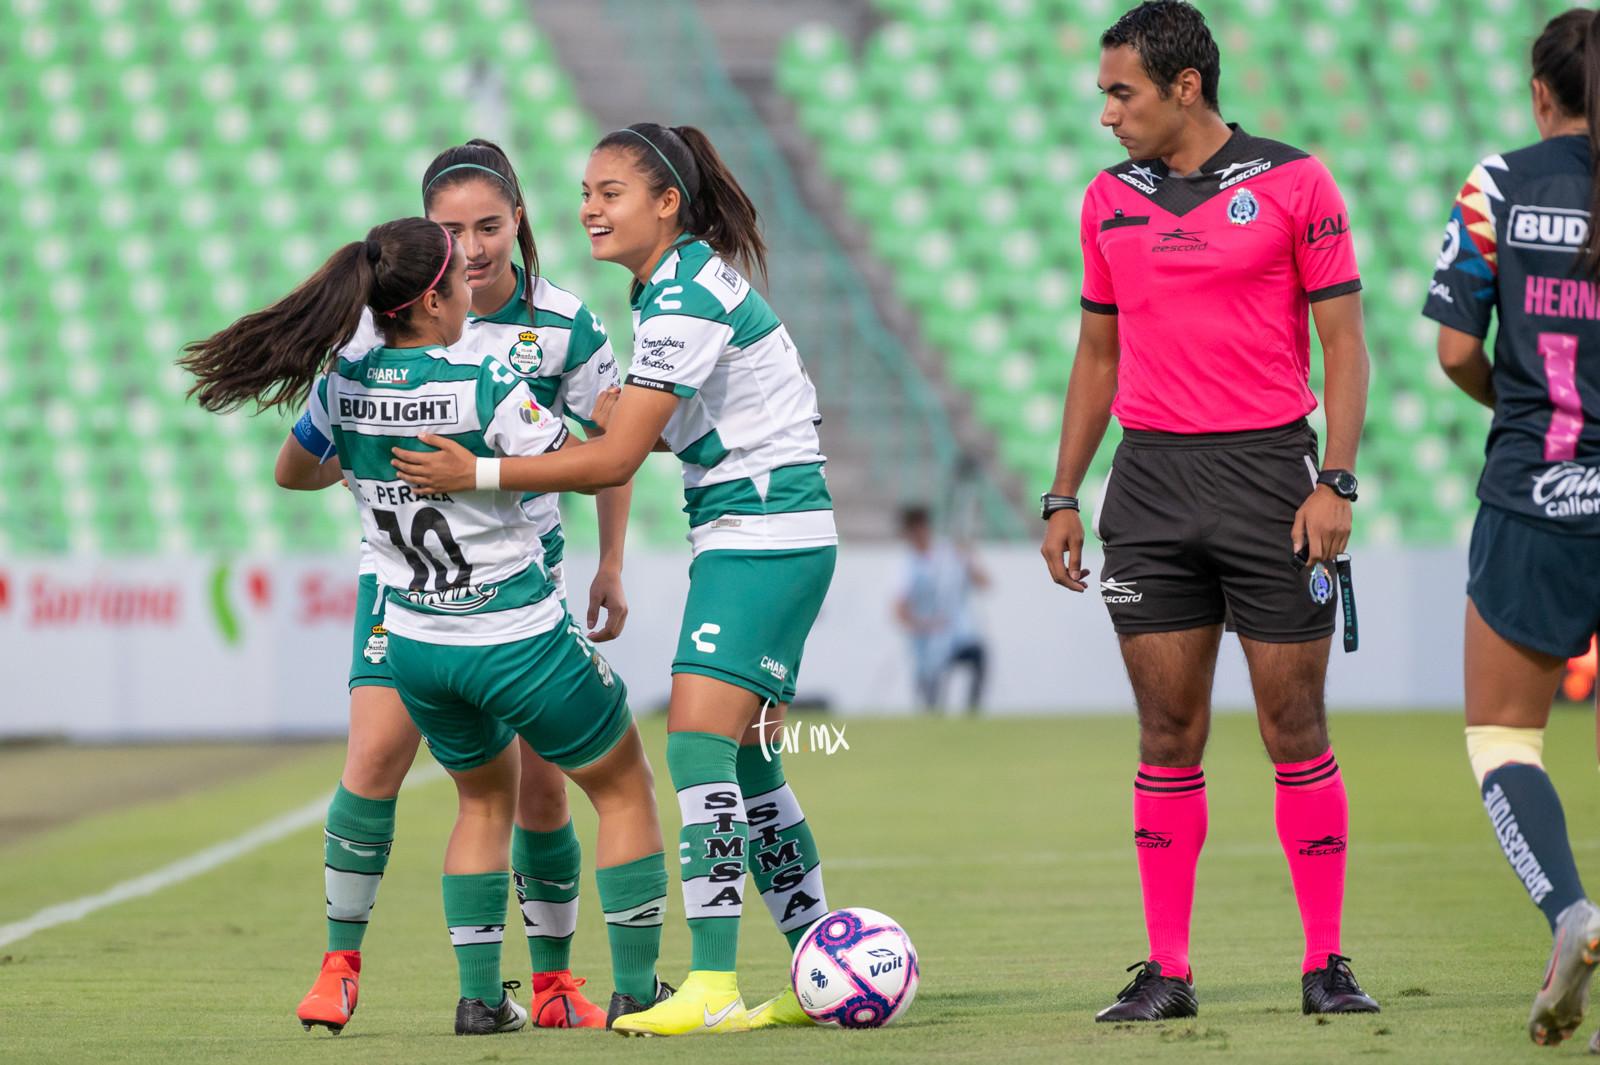 Cinthya Peraza, Daniela Delgado, Alexxandra Ramírez